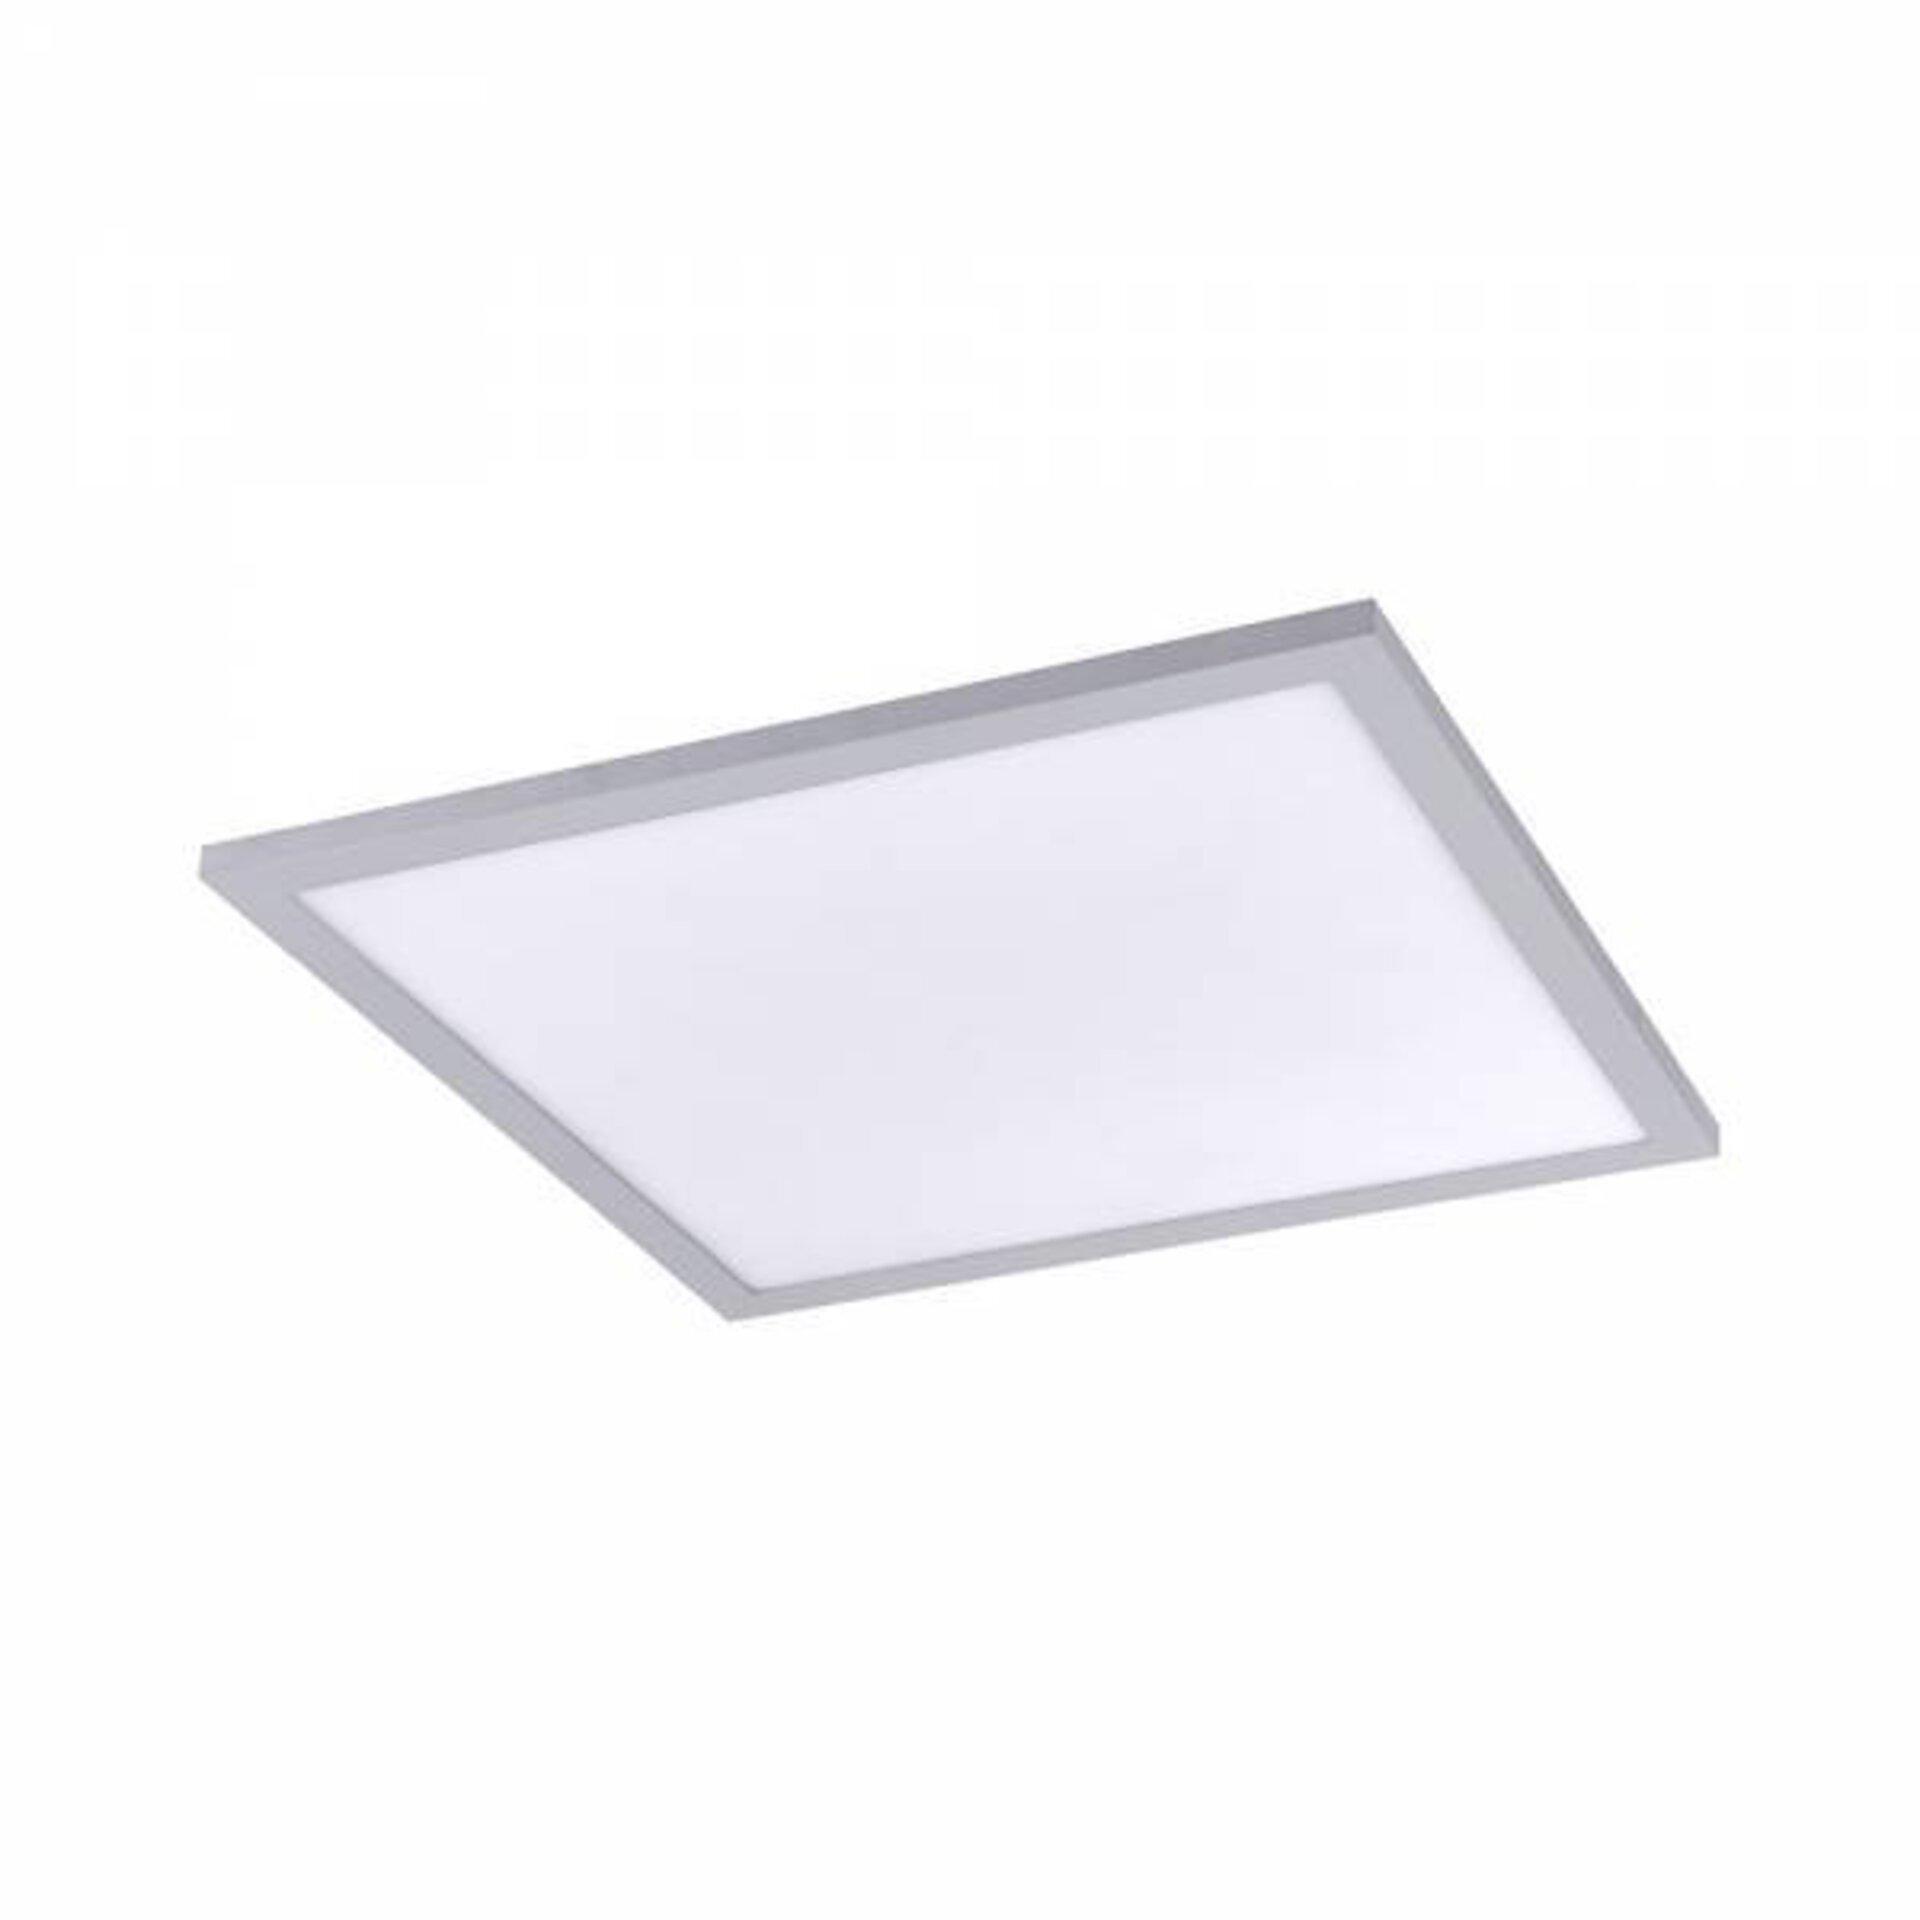 Deckenleuchte FLAT Leuchtendirekt Metall silber 45 x 6 x 45 cm